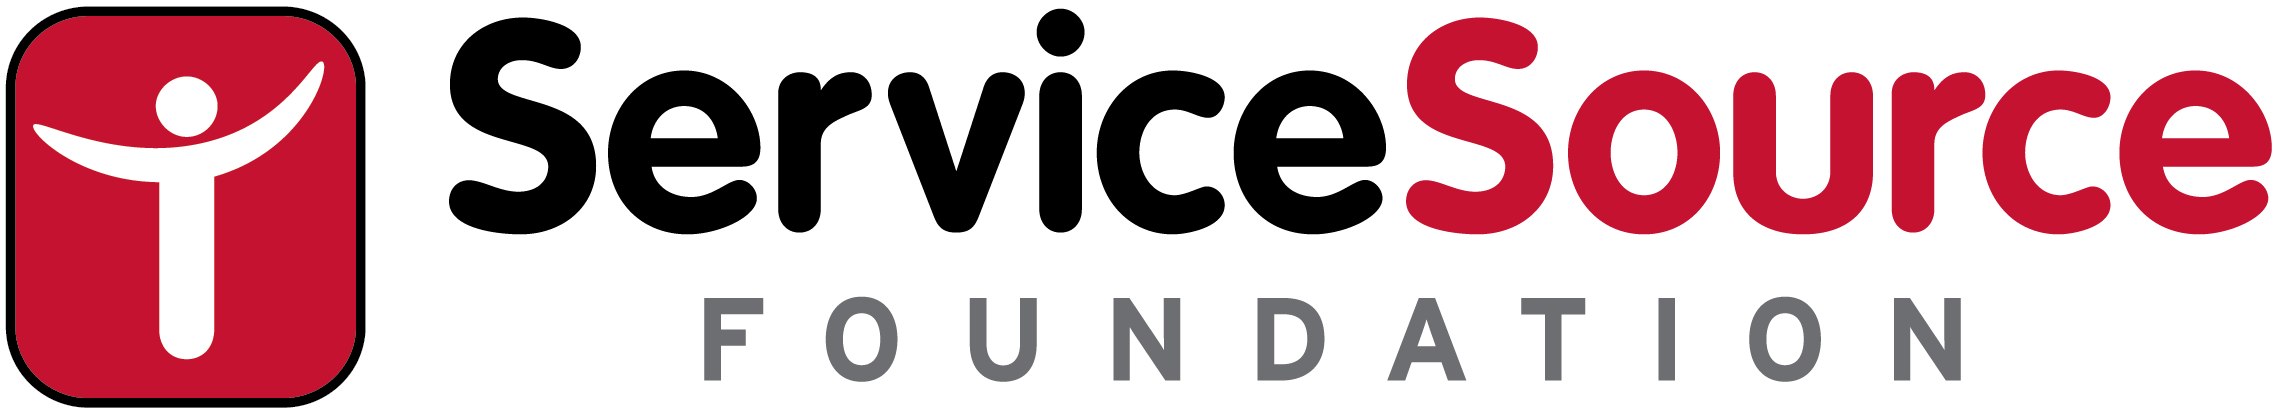 ServiceSource Foundation logo